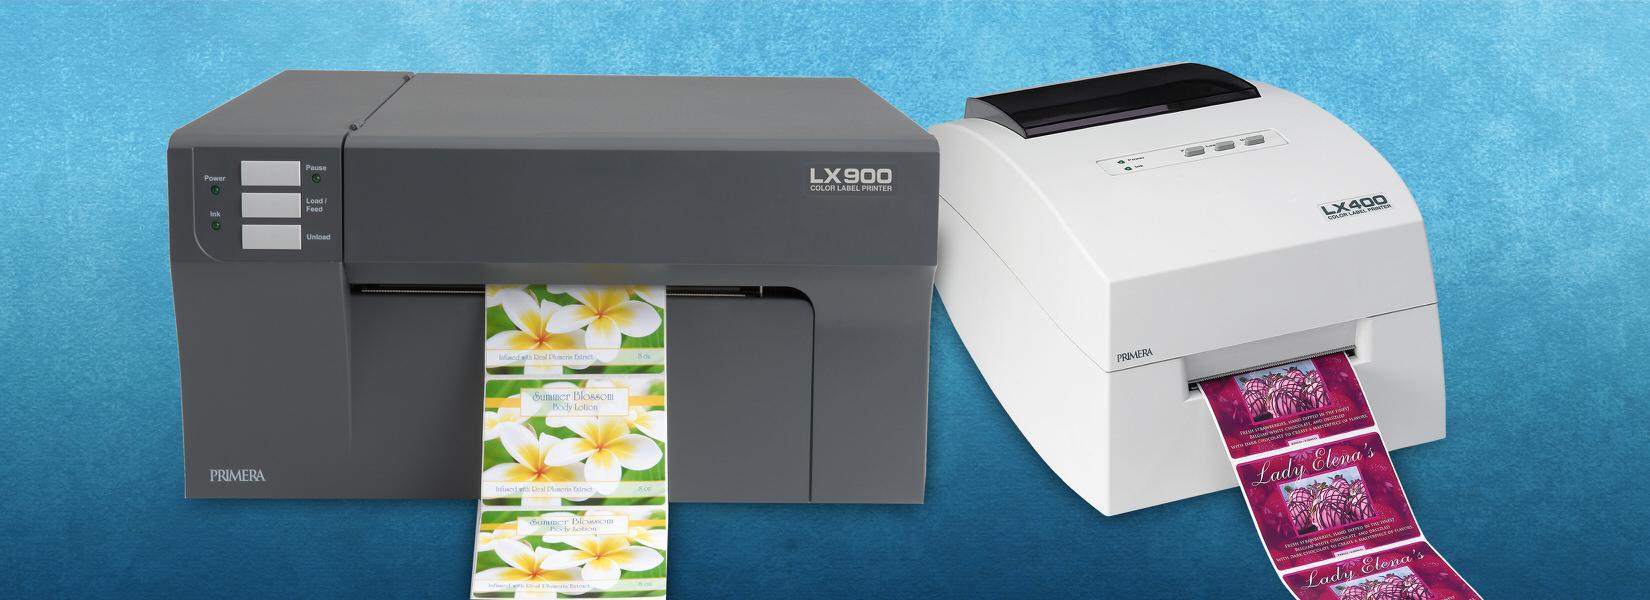 product printers color label printers